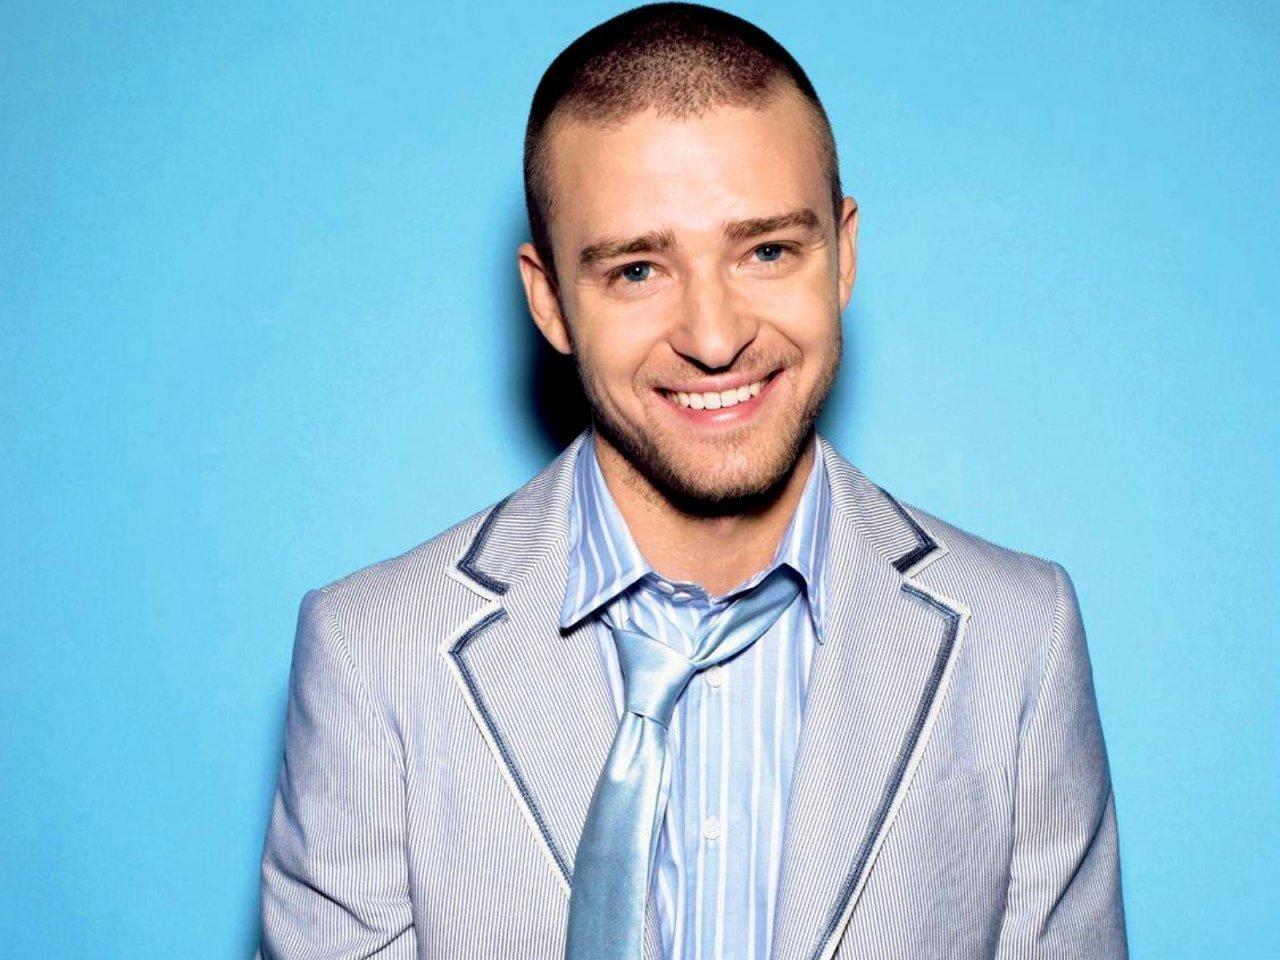 J.T. - Justin Timberlake Wallpaper (19104283) - Fanpop